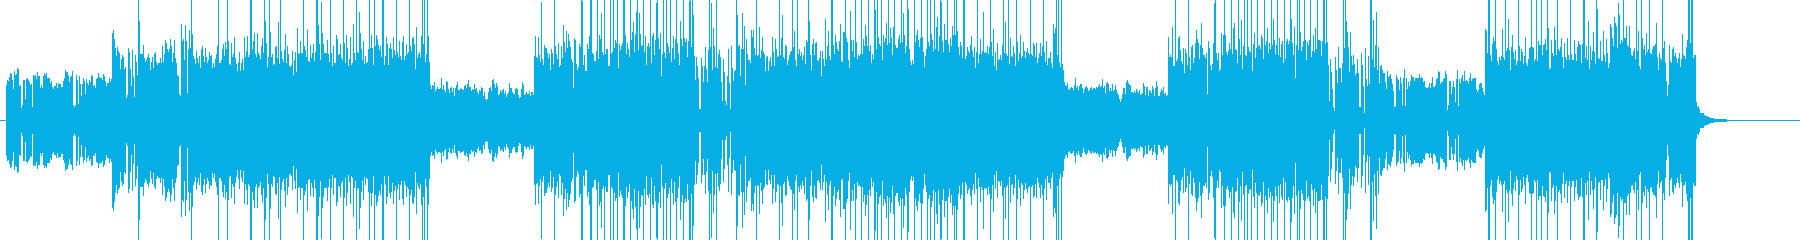 「DARK/ROCK」BGM329の再生済みの波形